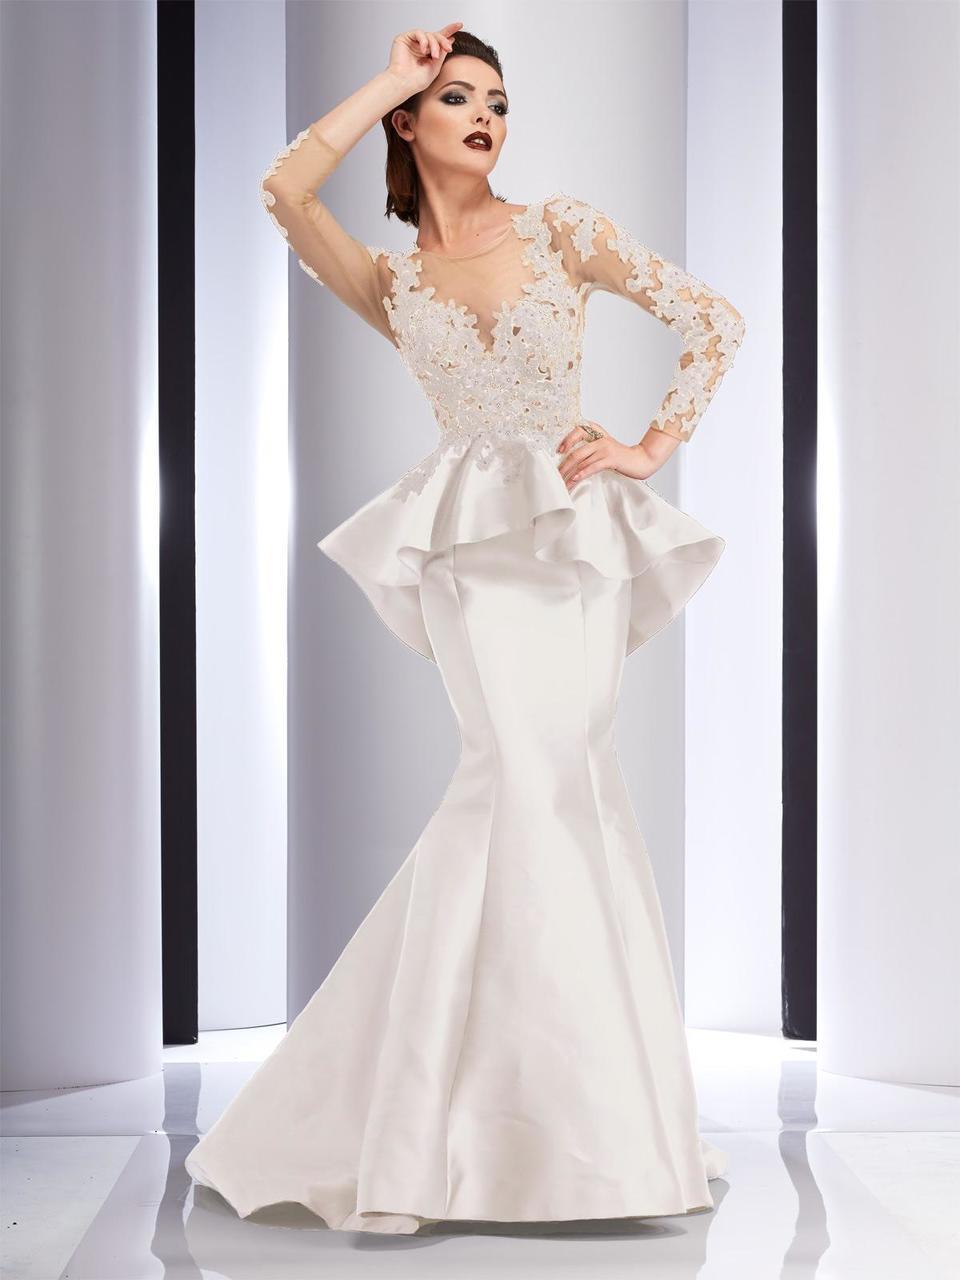 Clarisse - 4701 Floral Applique Mermaid Dress